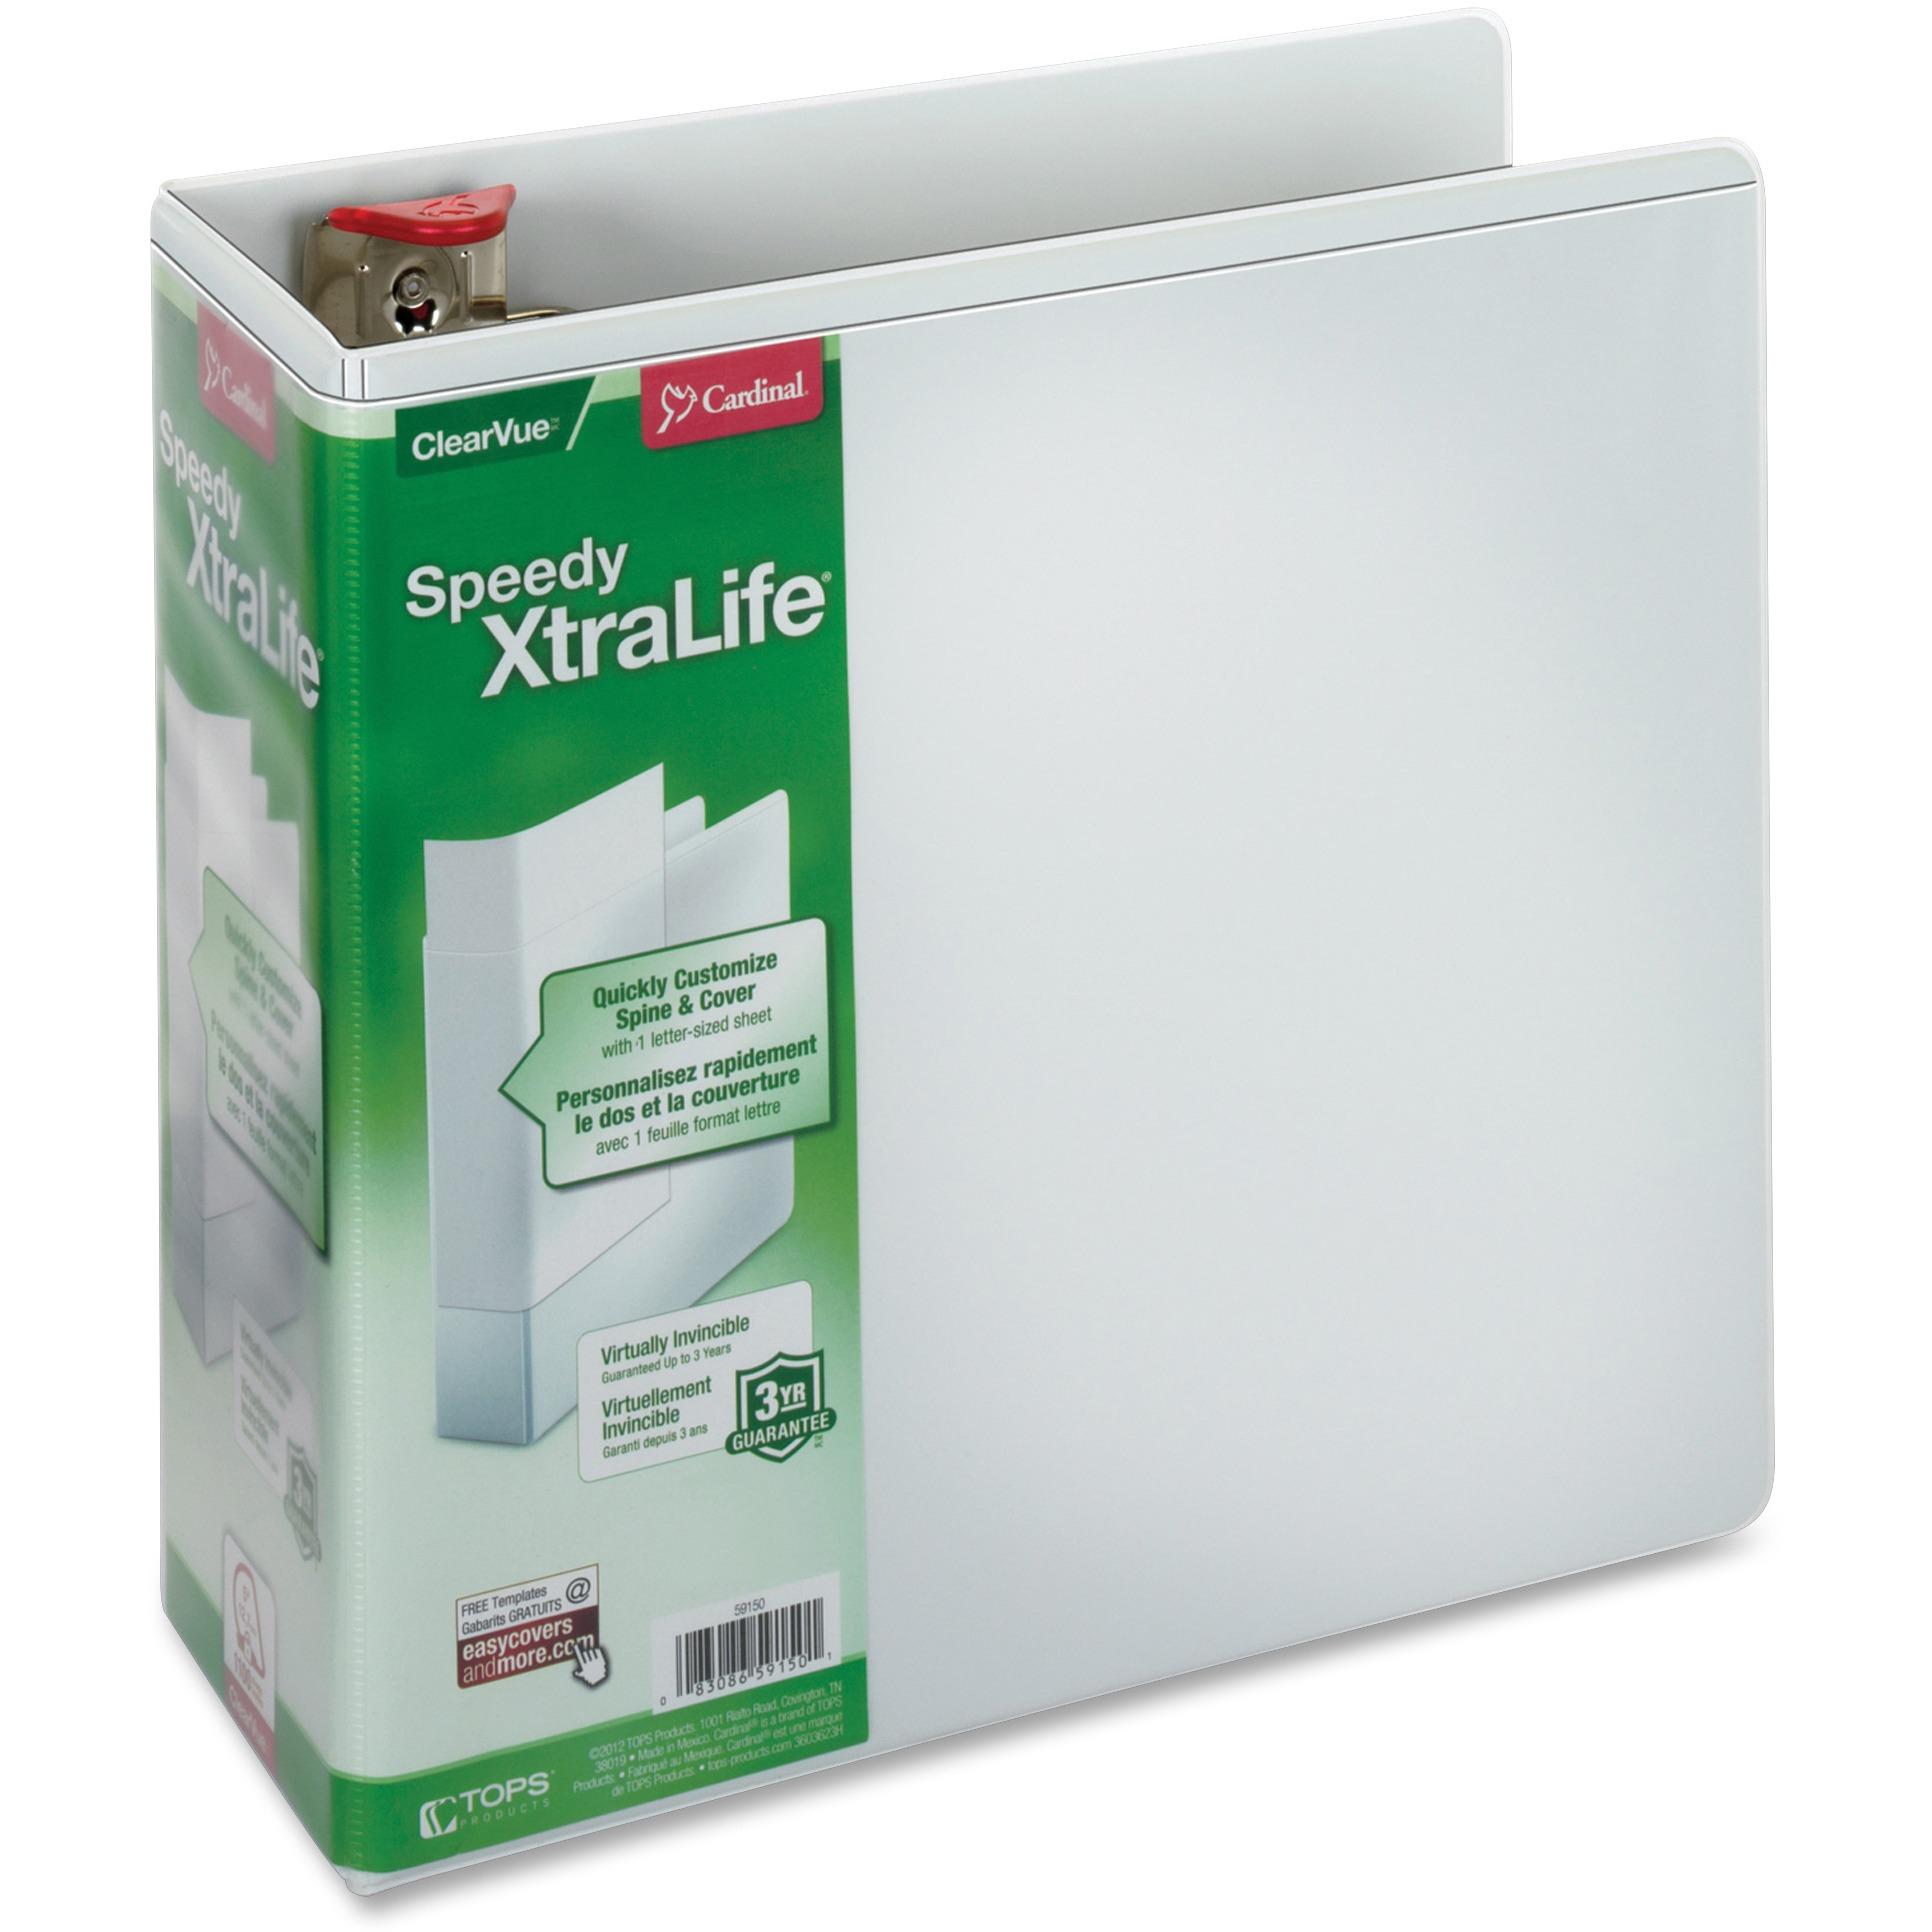 "Speedy XtraLife Non-Stick Locking Slant-D Ring Binder, 5"" Cap, 11 x 8 1/2, White"